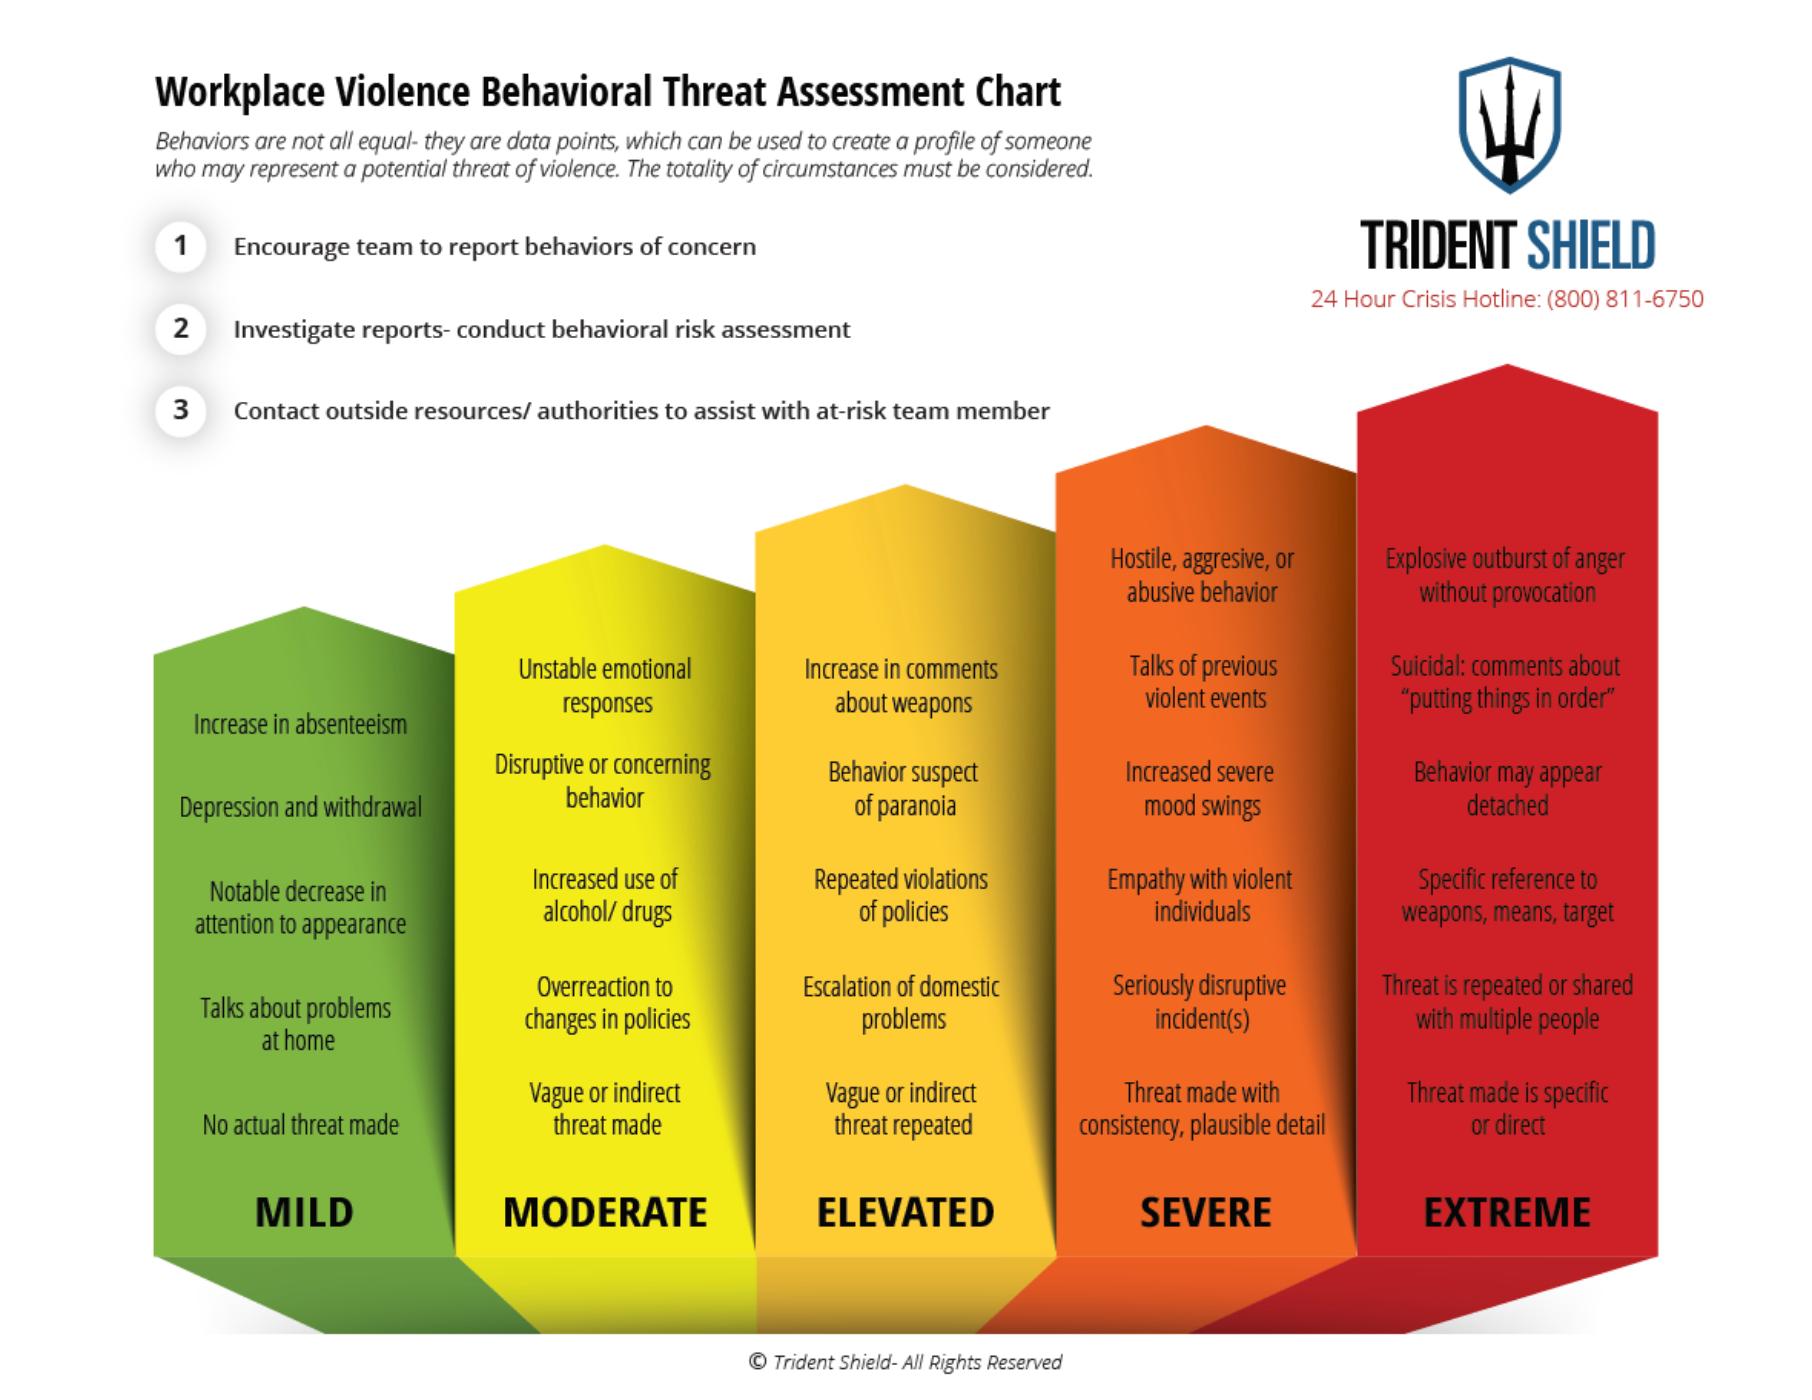 Threat Assessment Image